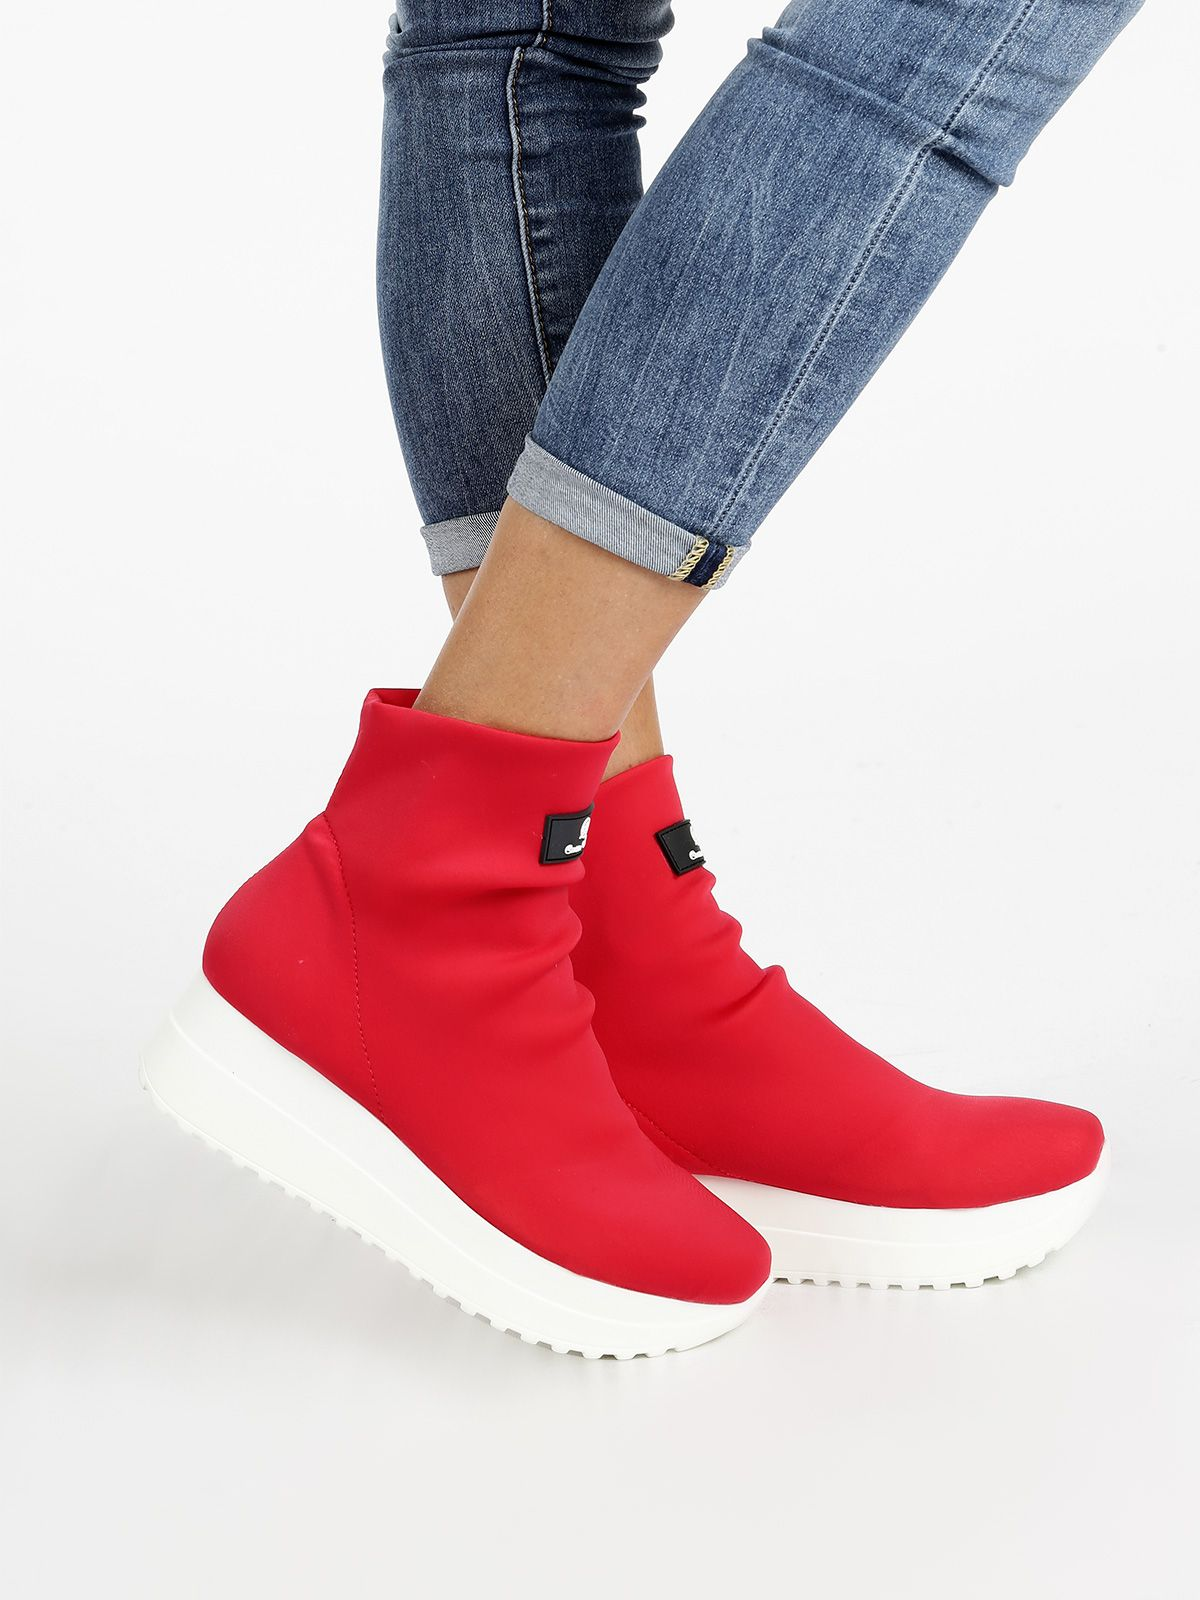 7d479ab78c Sneakers a calzino rosse nel 2019 | Mecshopping | Scarpe Donna ...